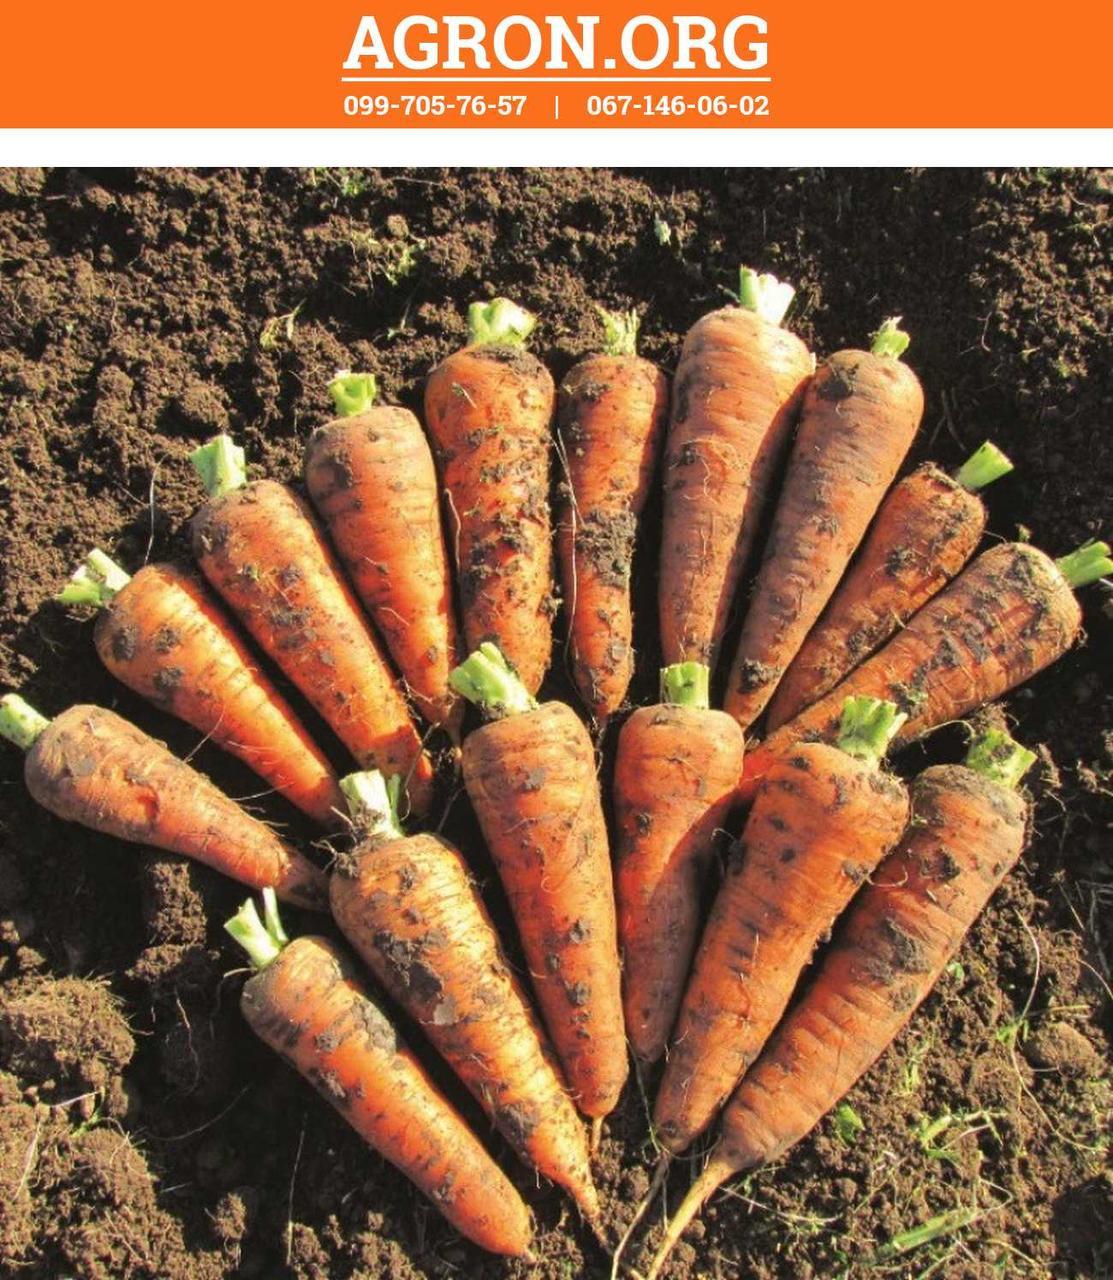 ЛС-2513 F1 (LS-2513 F1) семена моркови Берликум lucky Seed 250 г